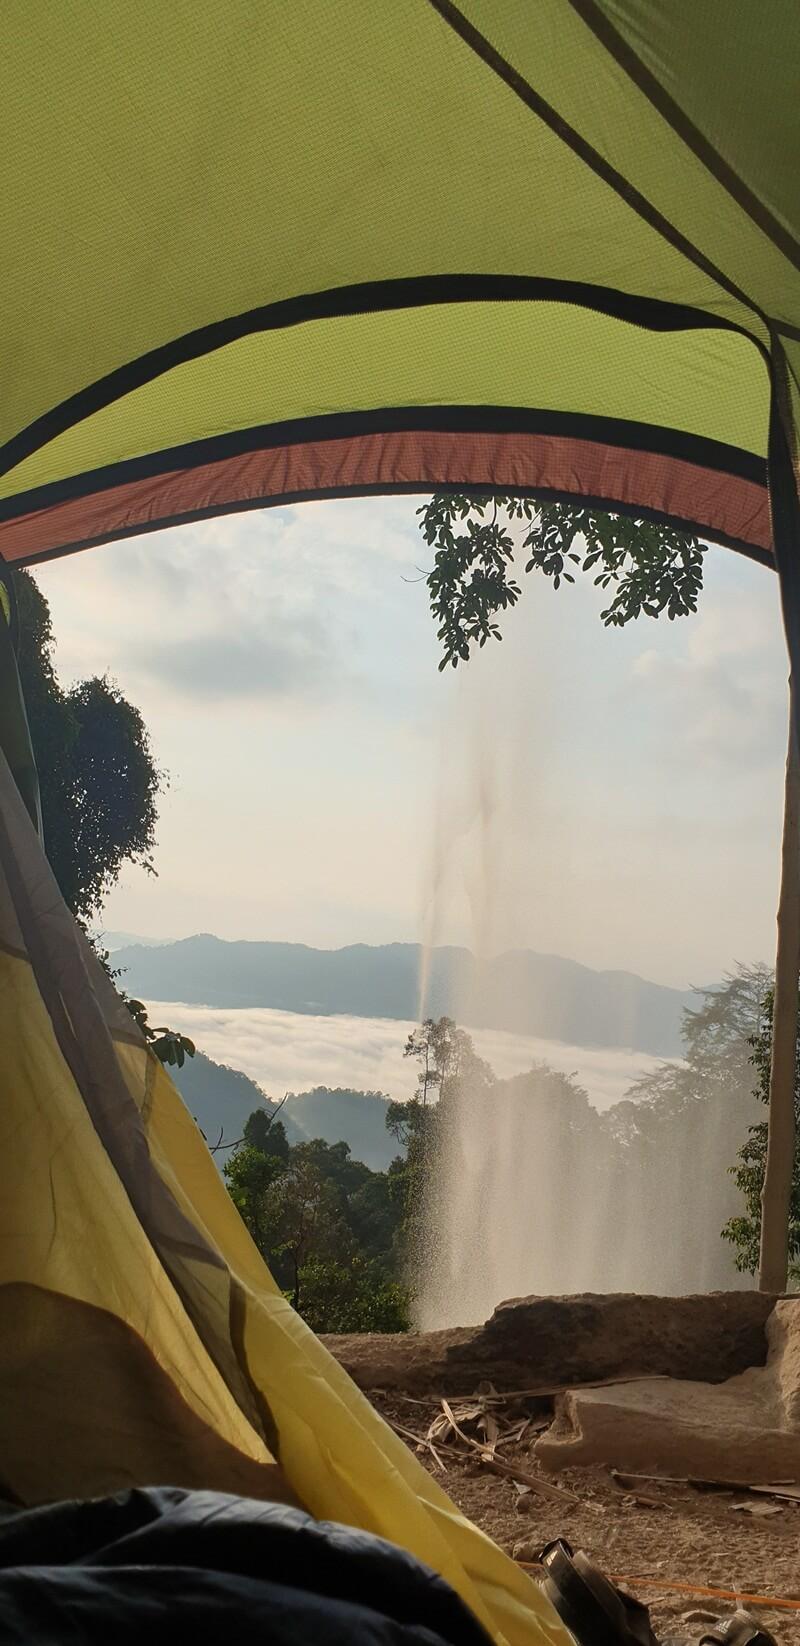 Camping Di Belakang Air Terjun Batang Kapas